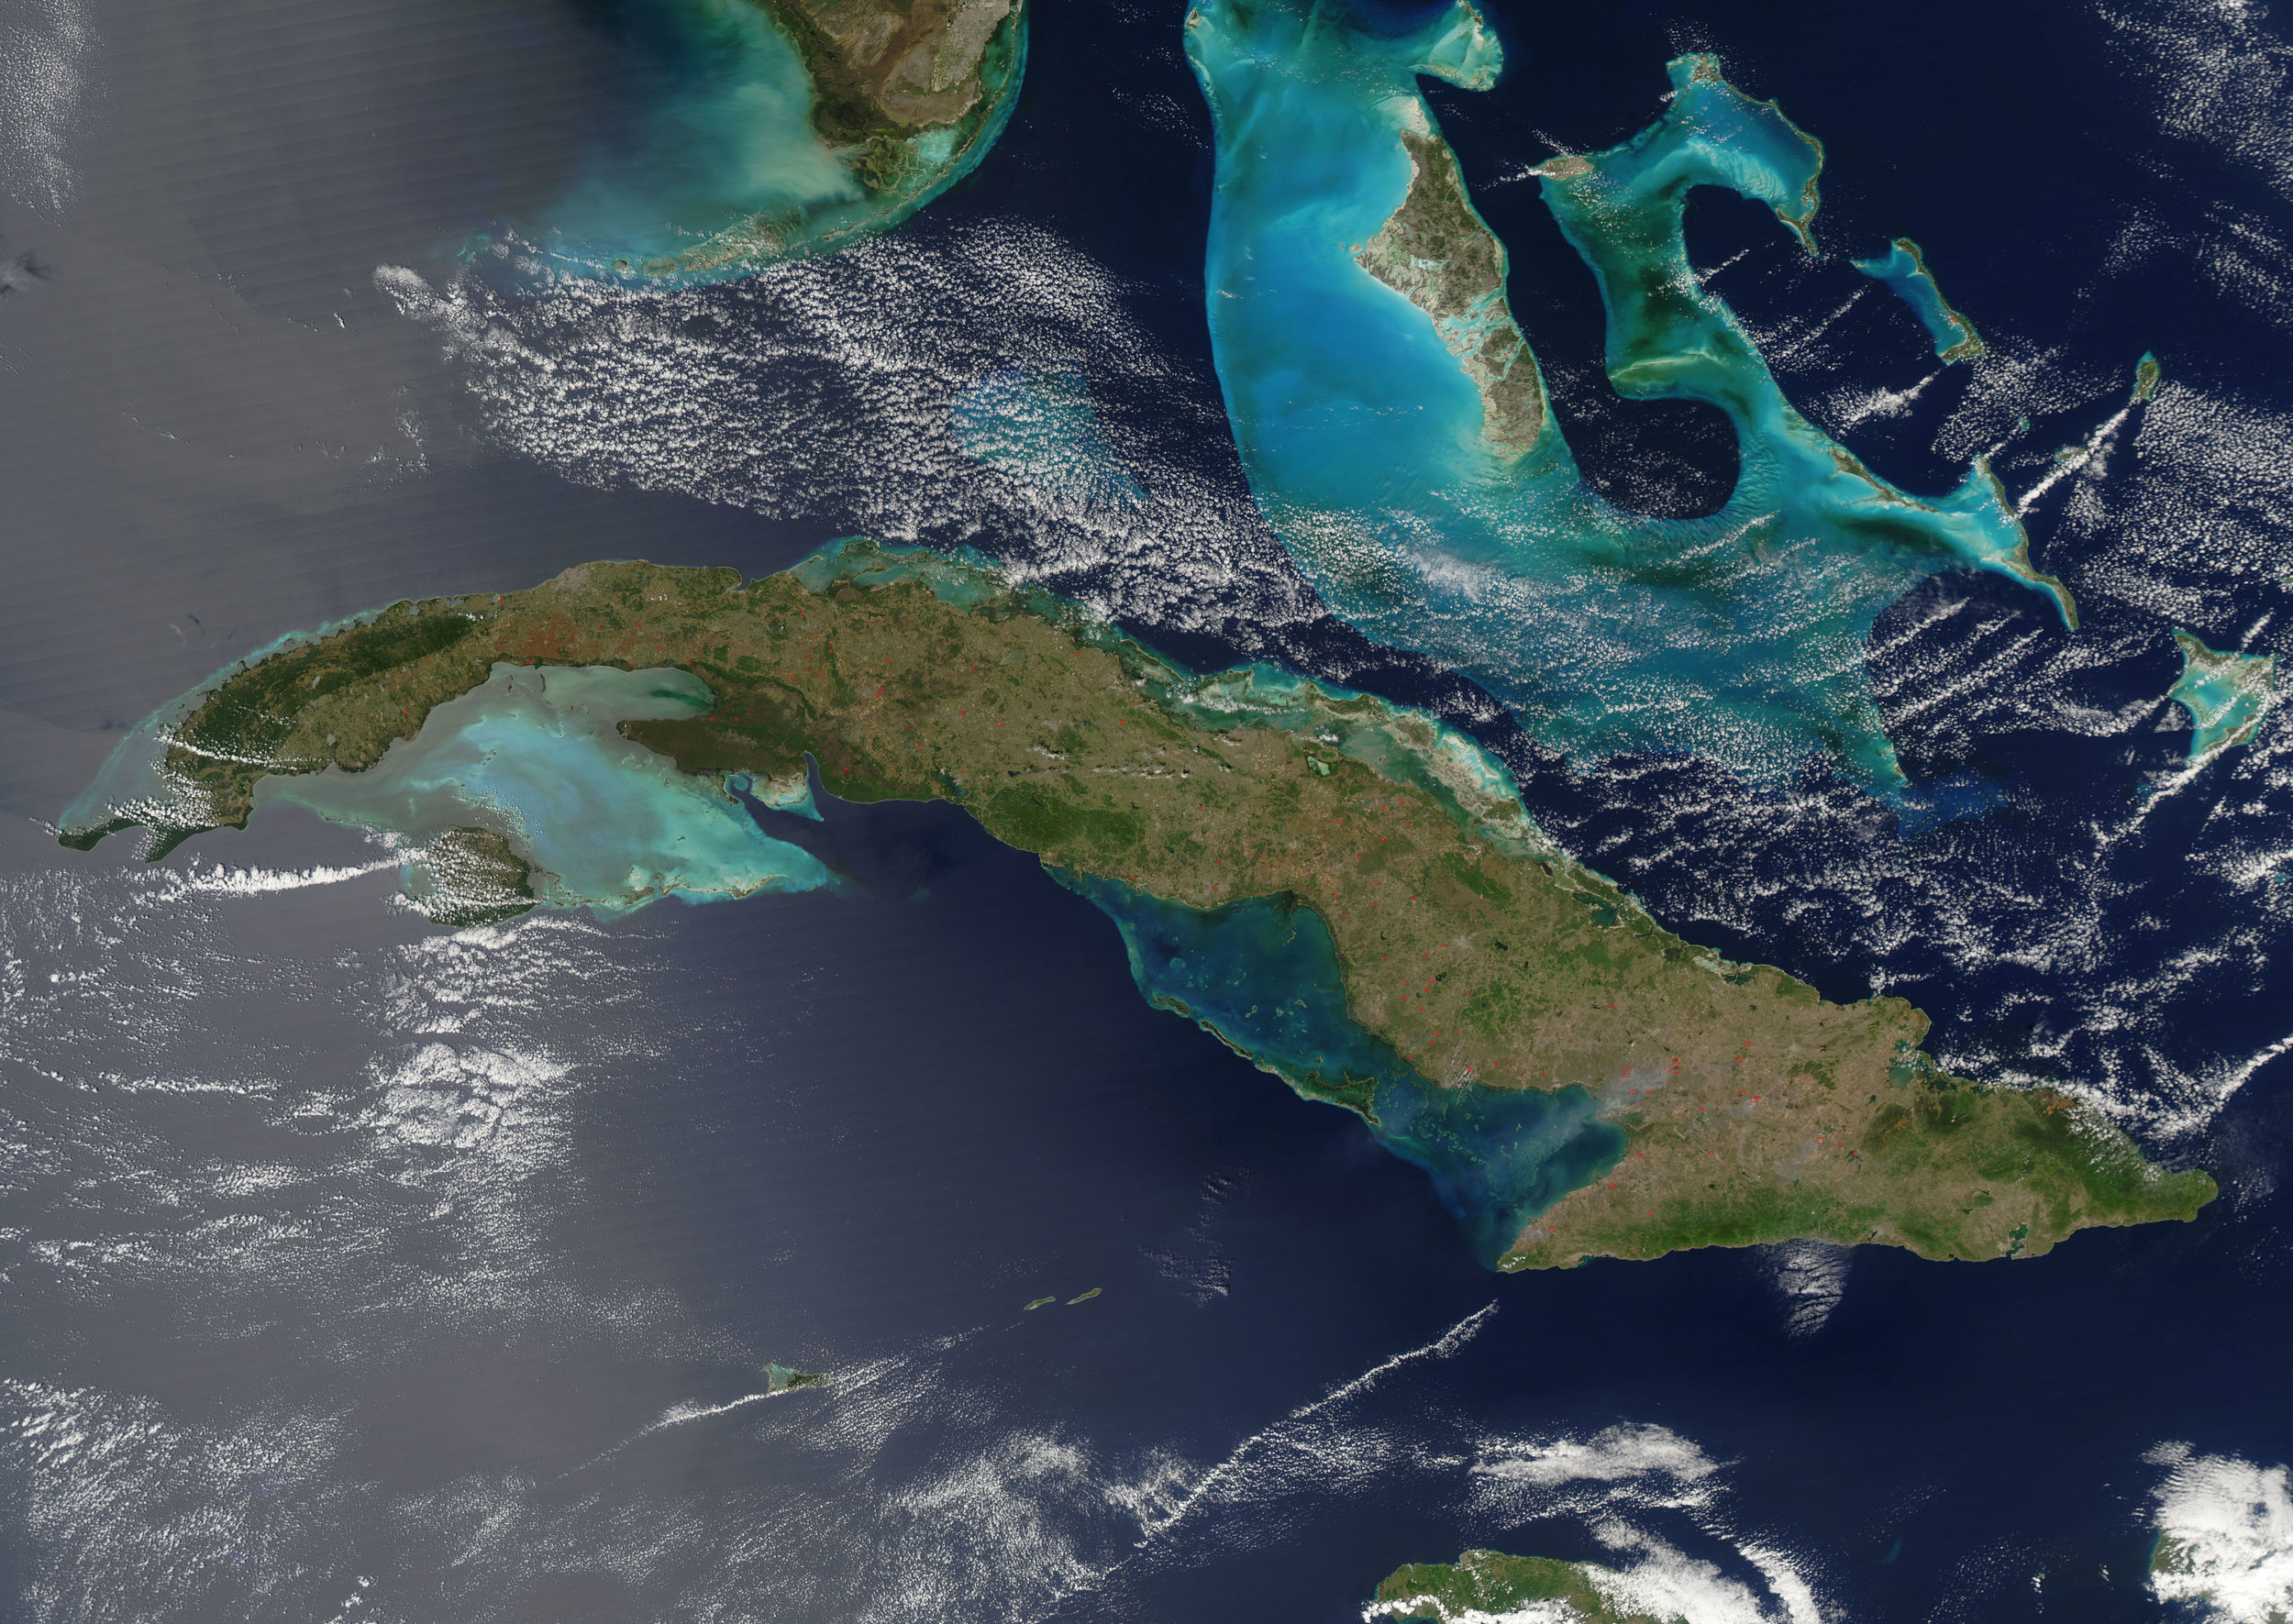 Cuba, the Bahamas, and Florida from space. Photo: NASA